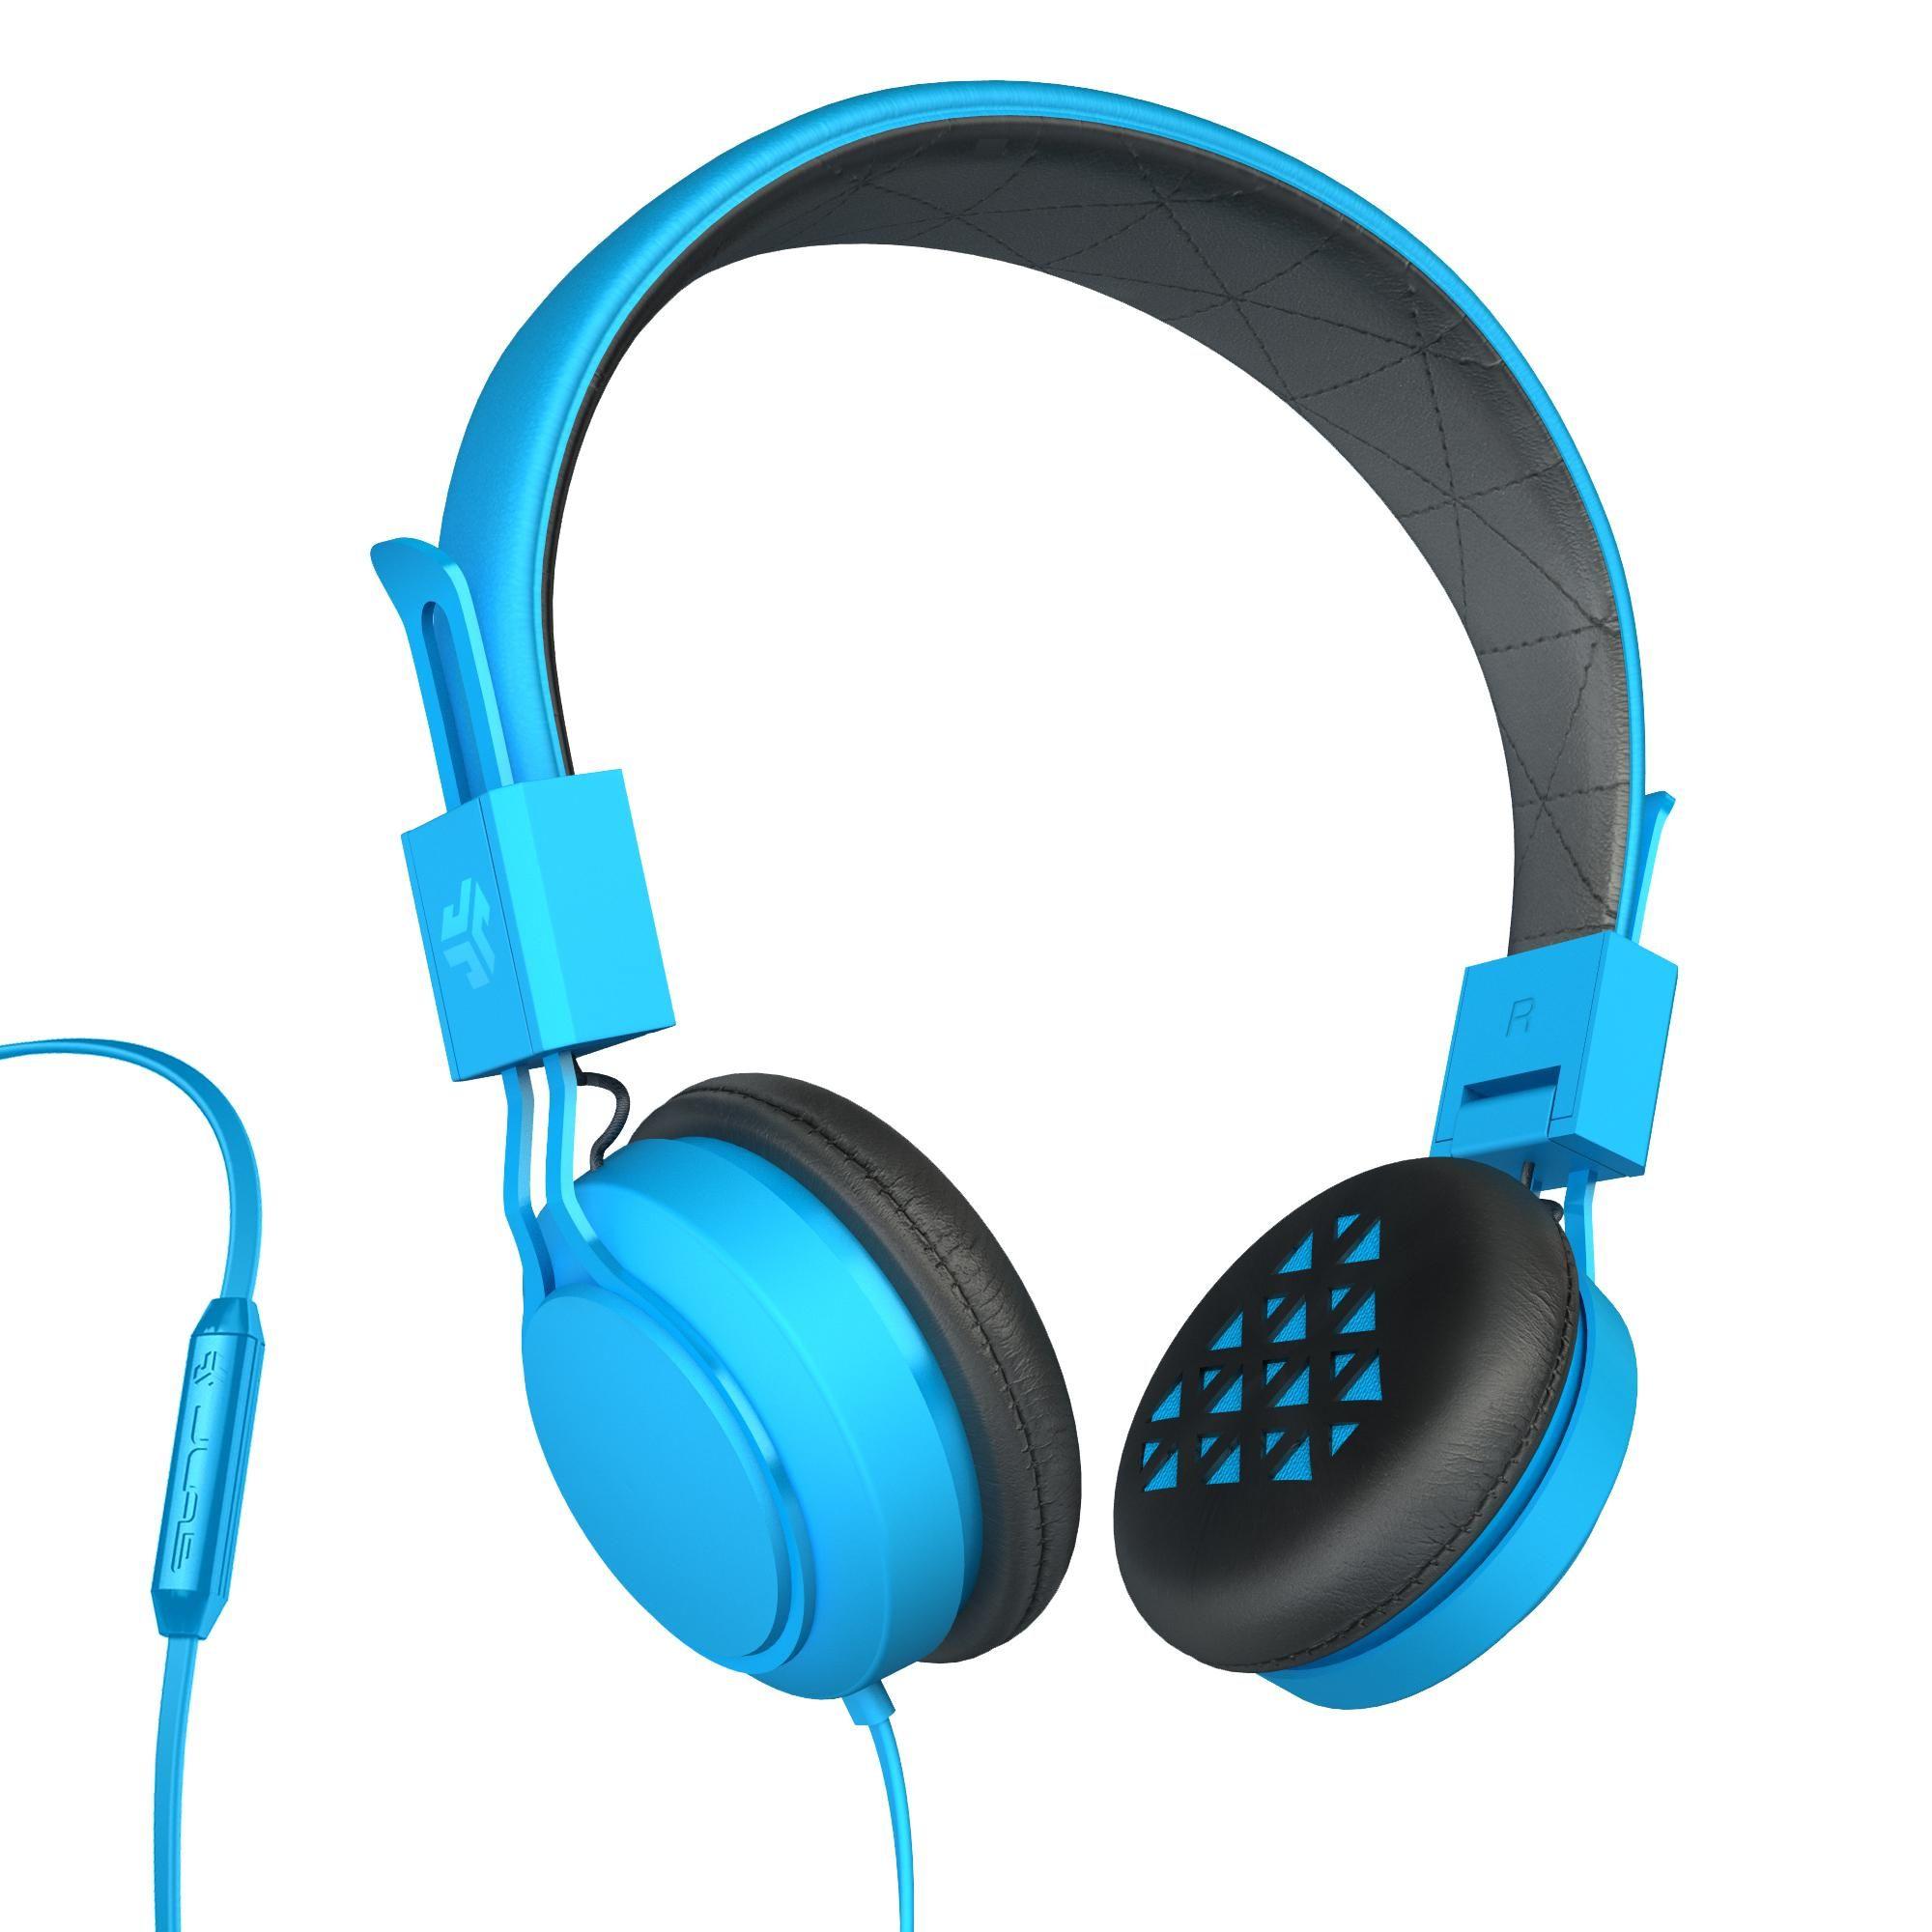 JLab INTRO Premium OnEar Headphones with